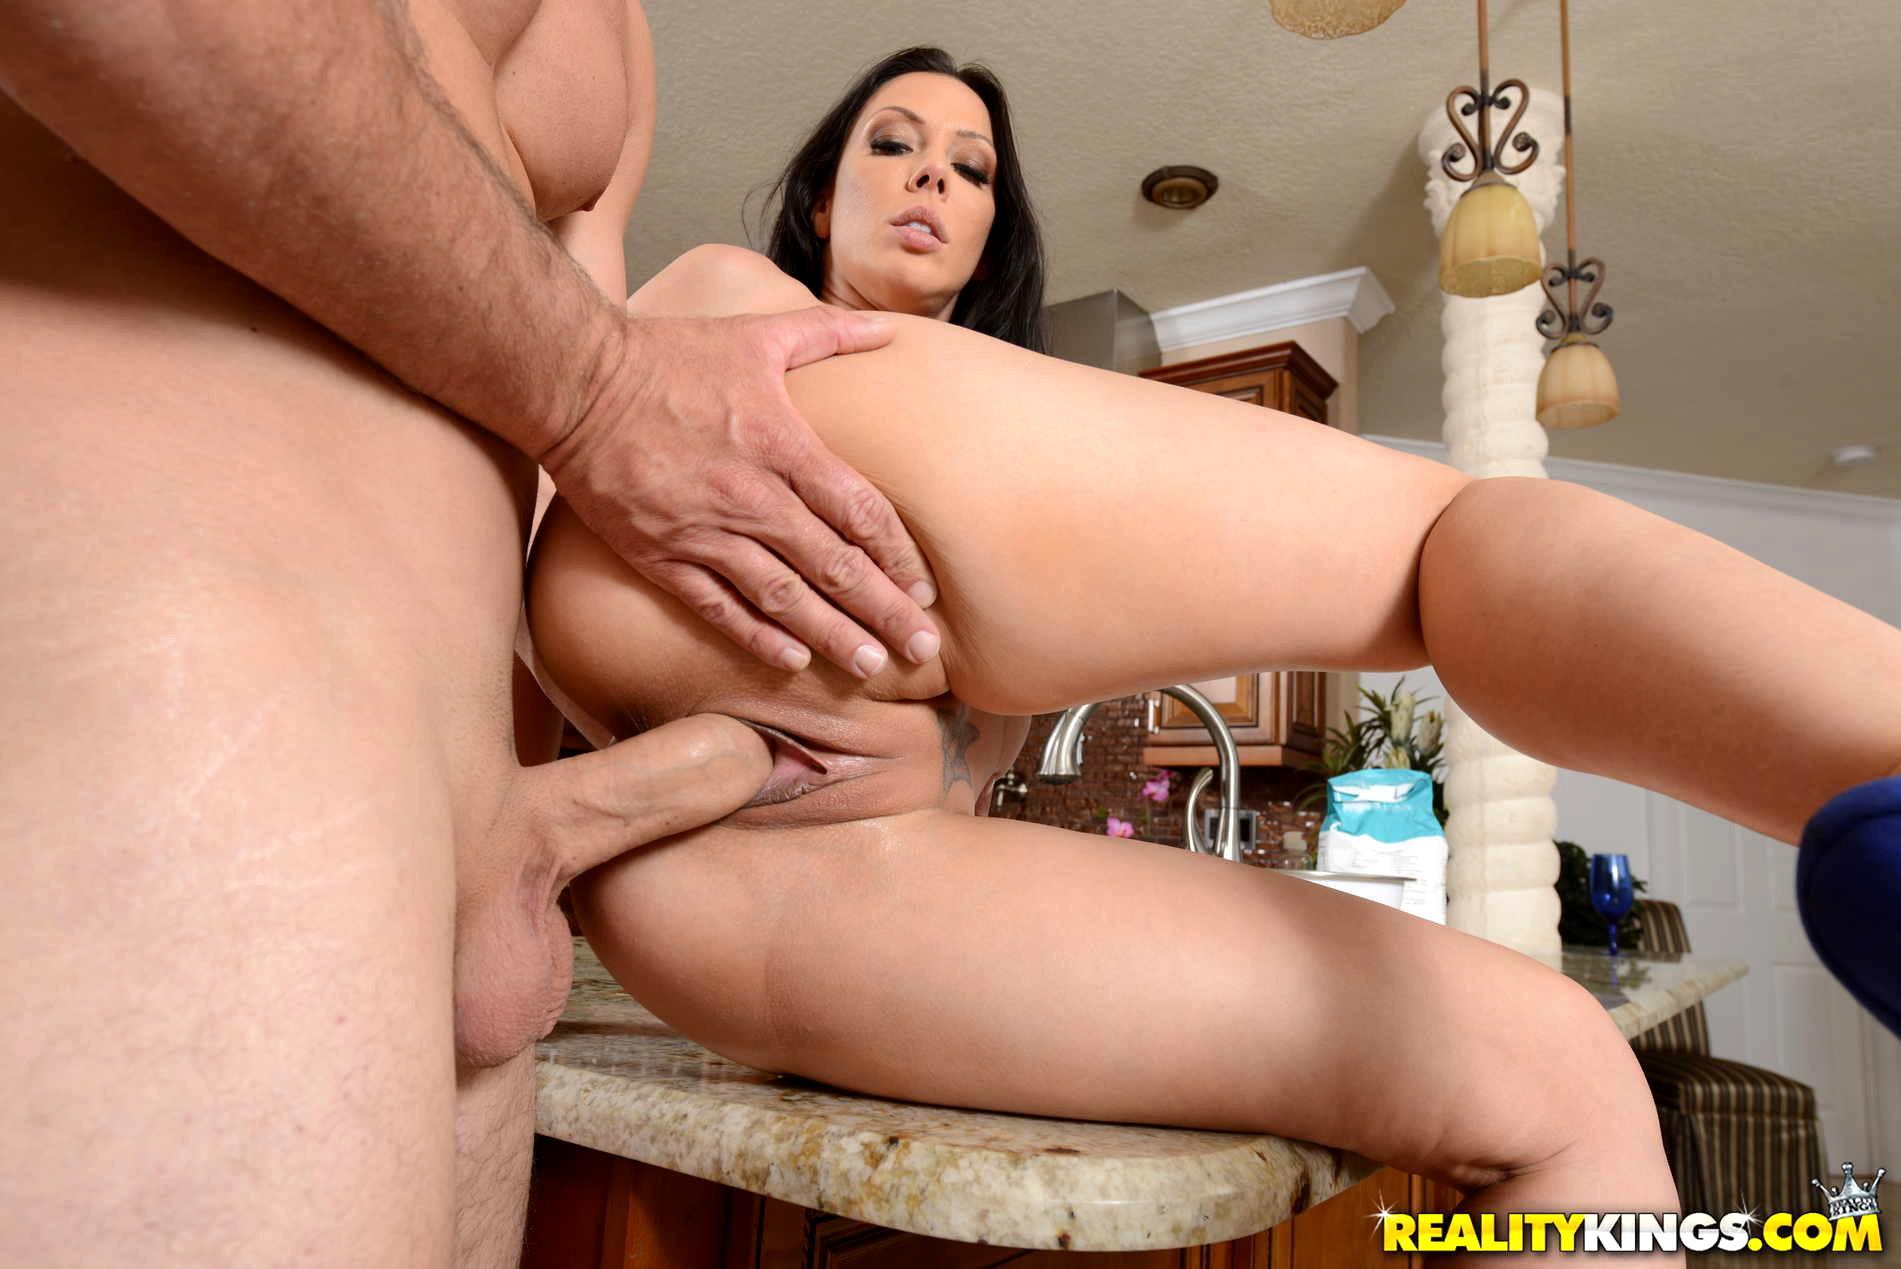 Babe Today Reality Kings Rachel Starr Funny Big Tits Porngatherer Porn Pics-4273